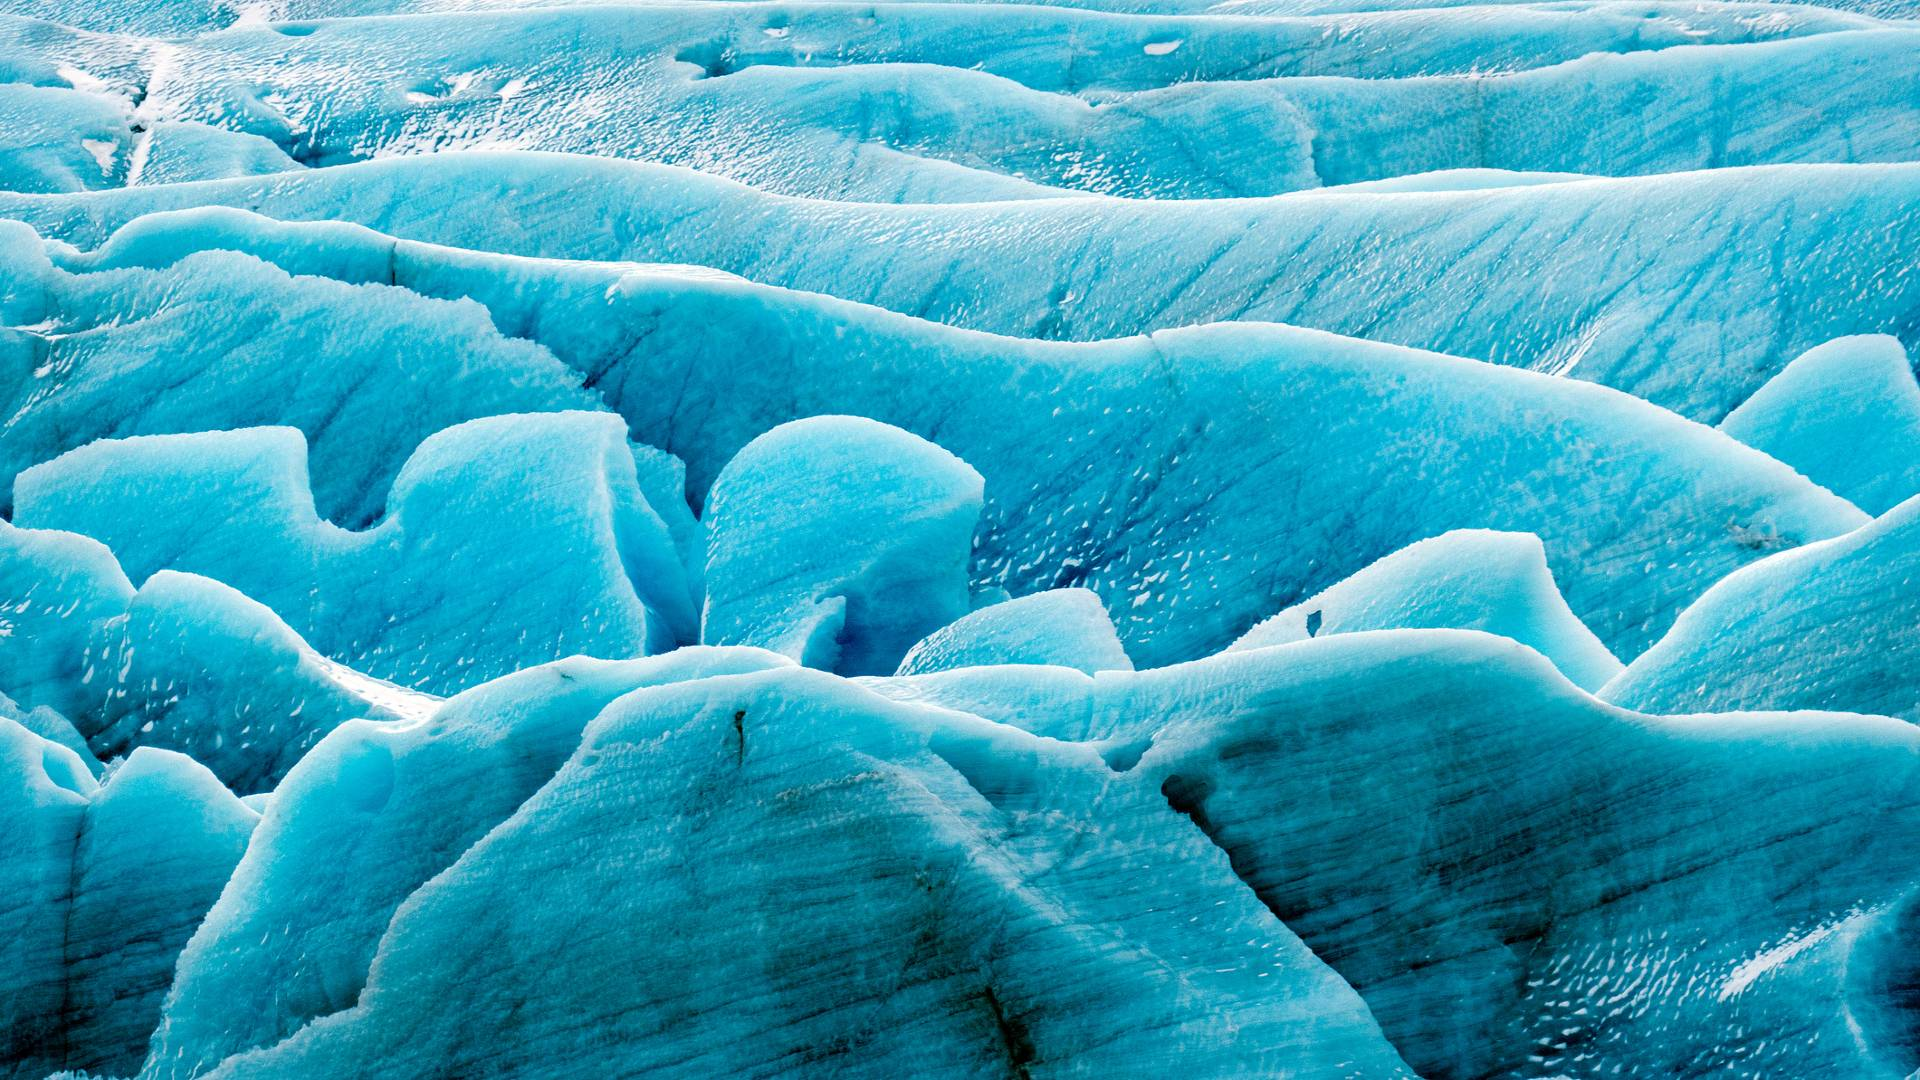 An Icelandic glacier up close